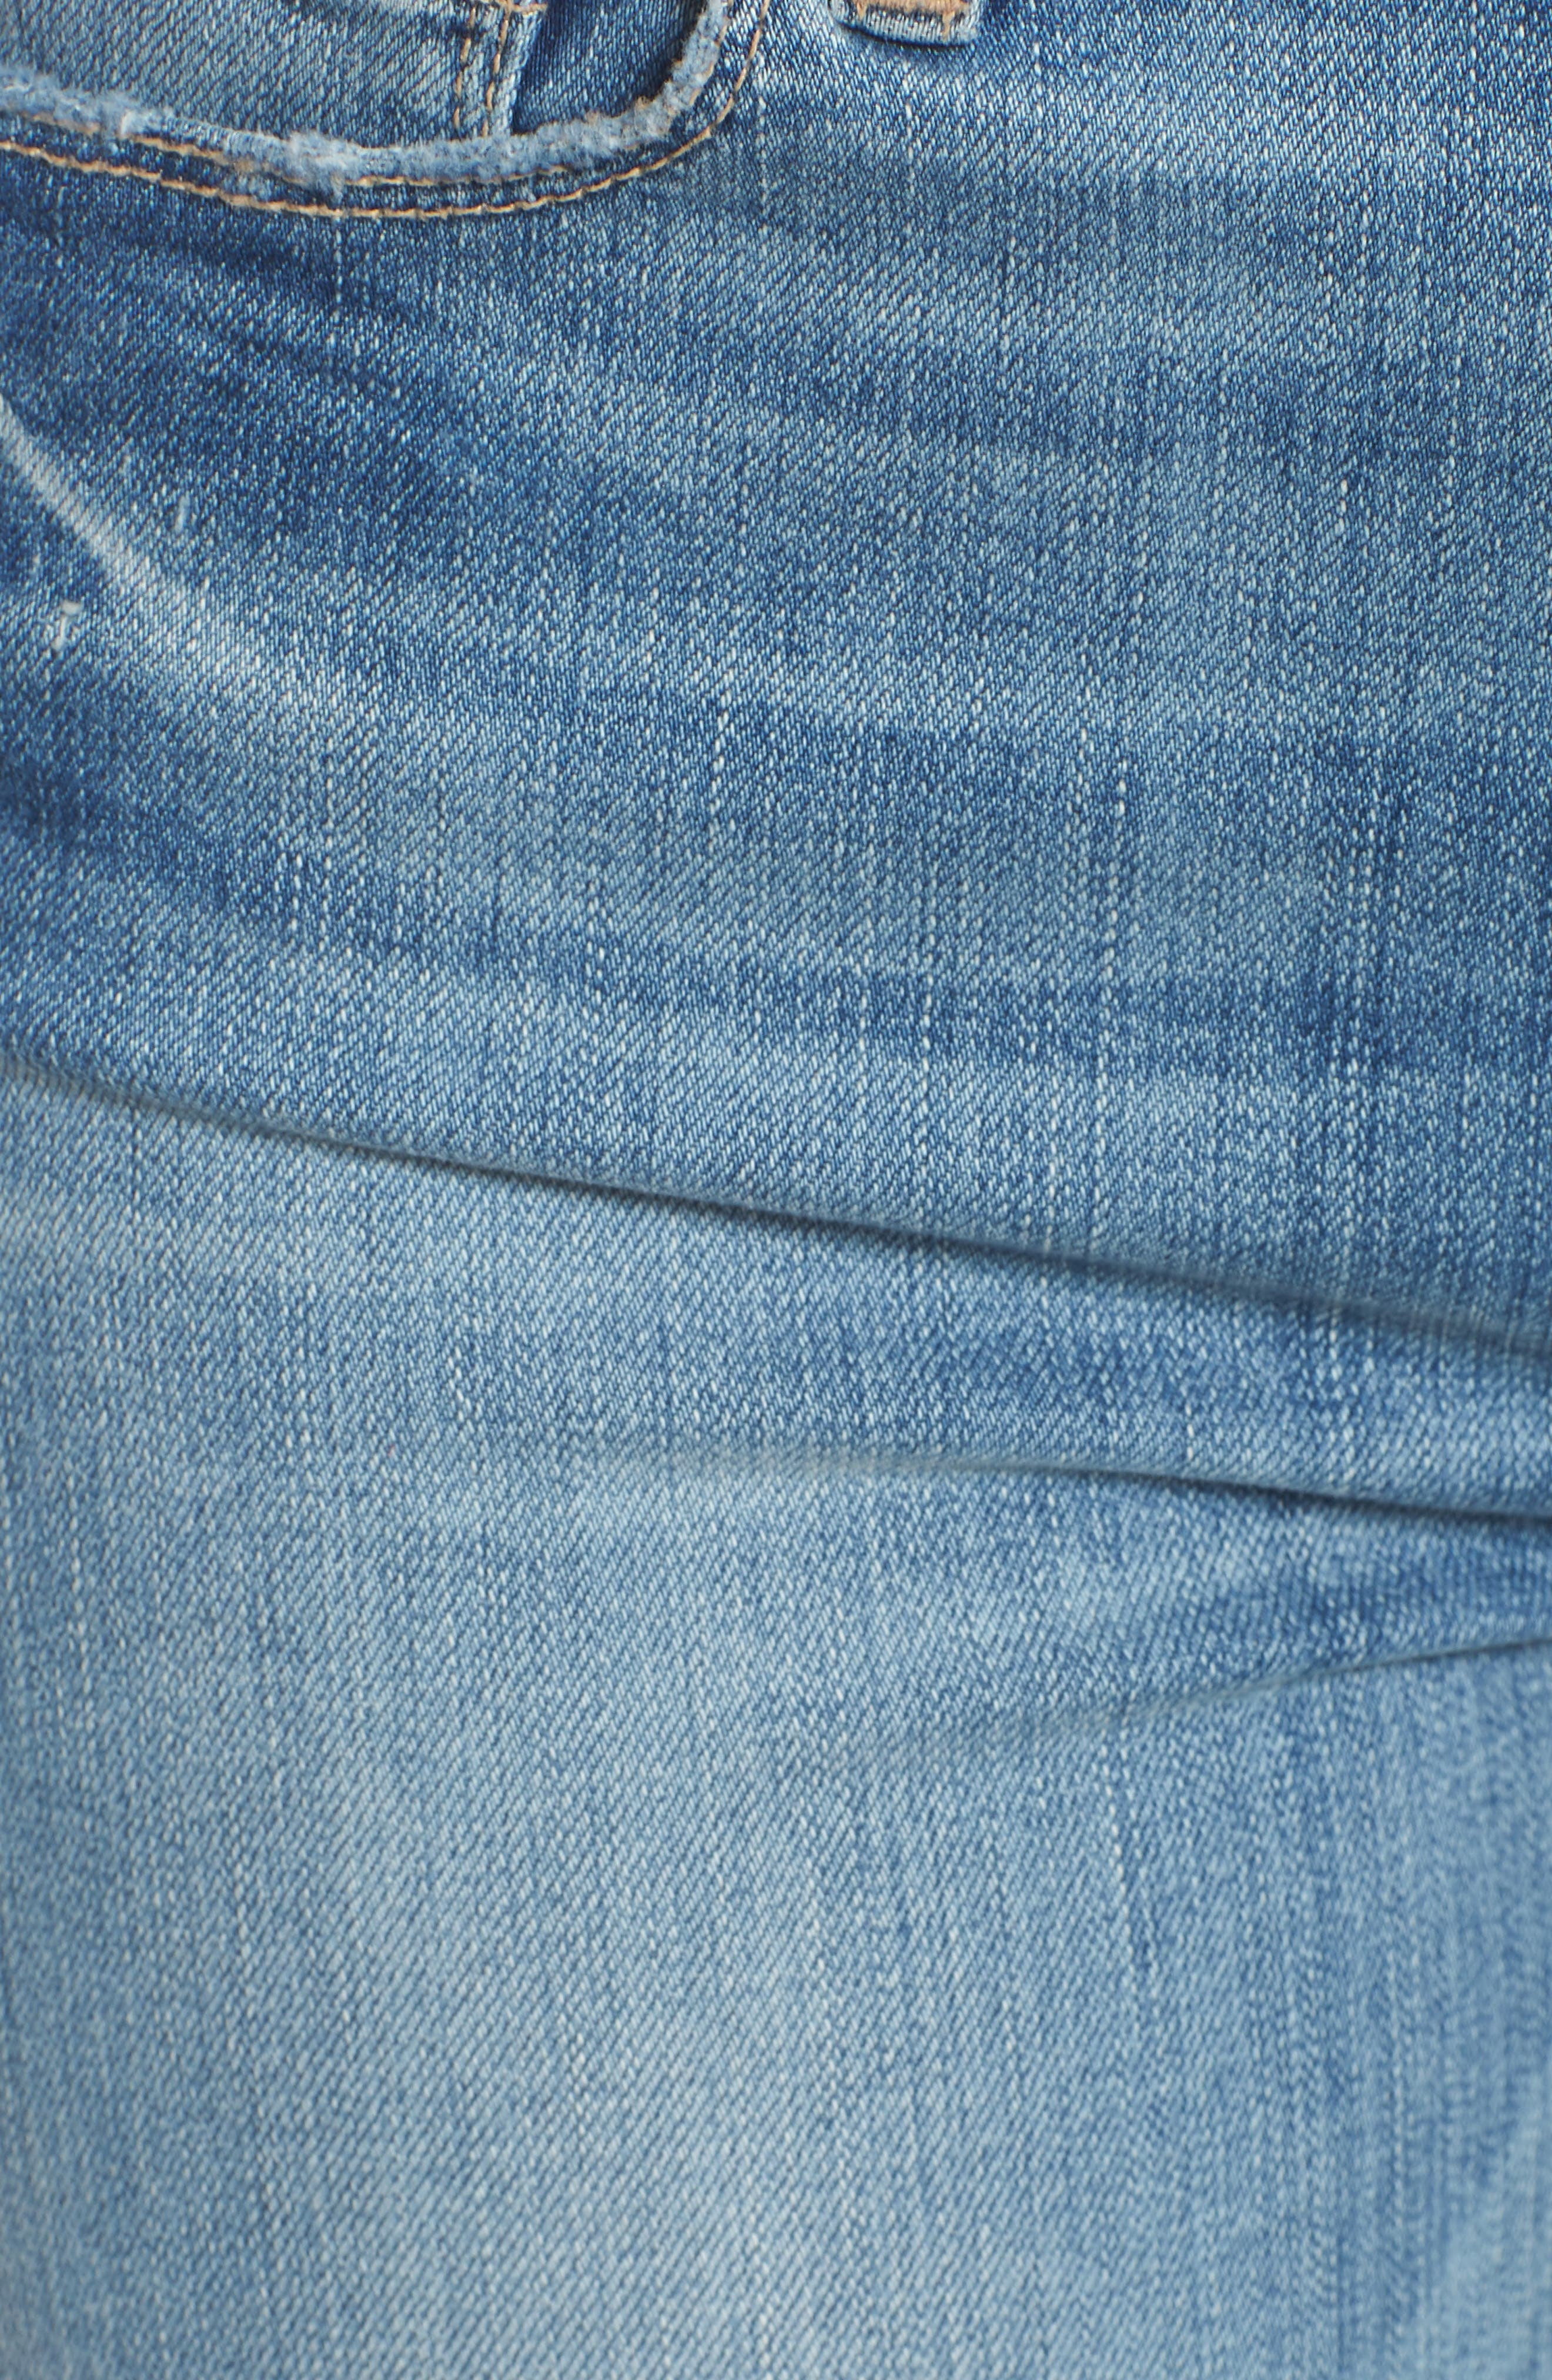 Hoxton High Waist Ankle Skinny Jeans,                             Alternate thumbnail 5, color,                             400